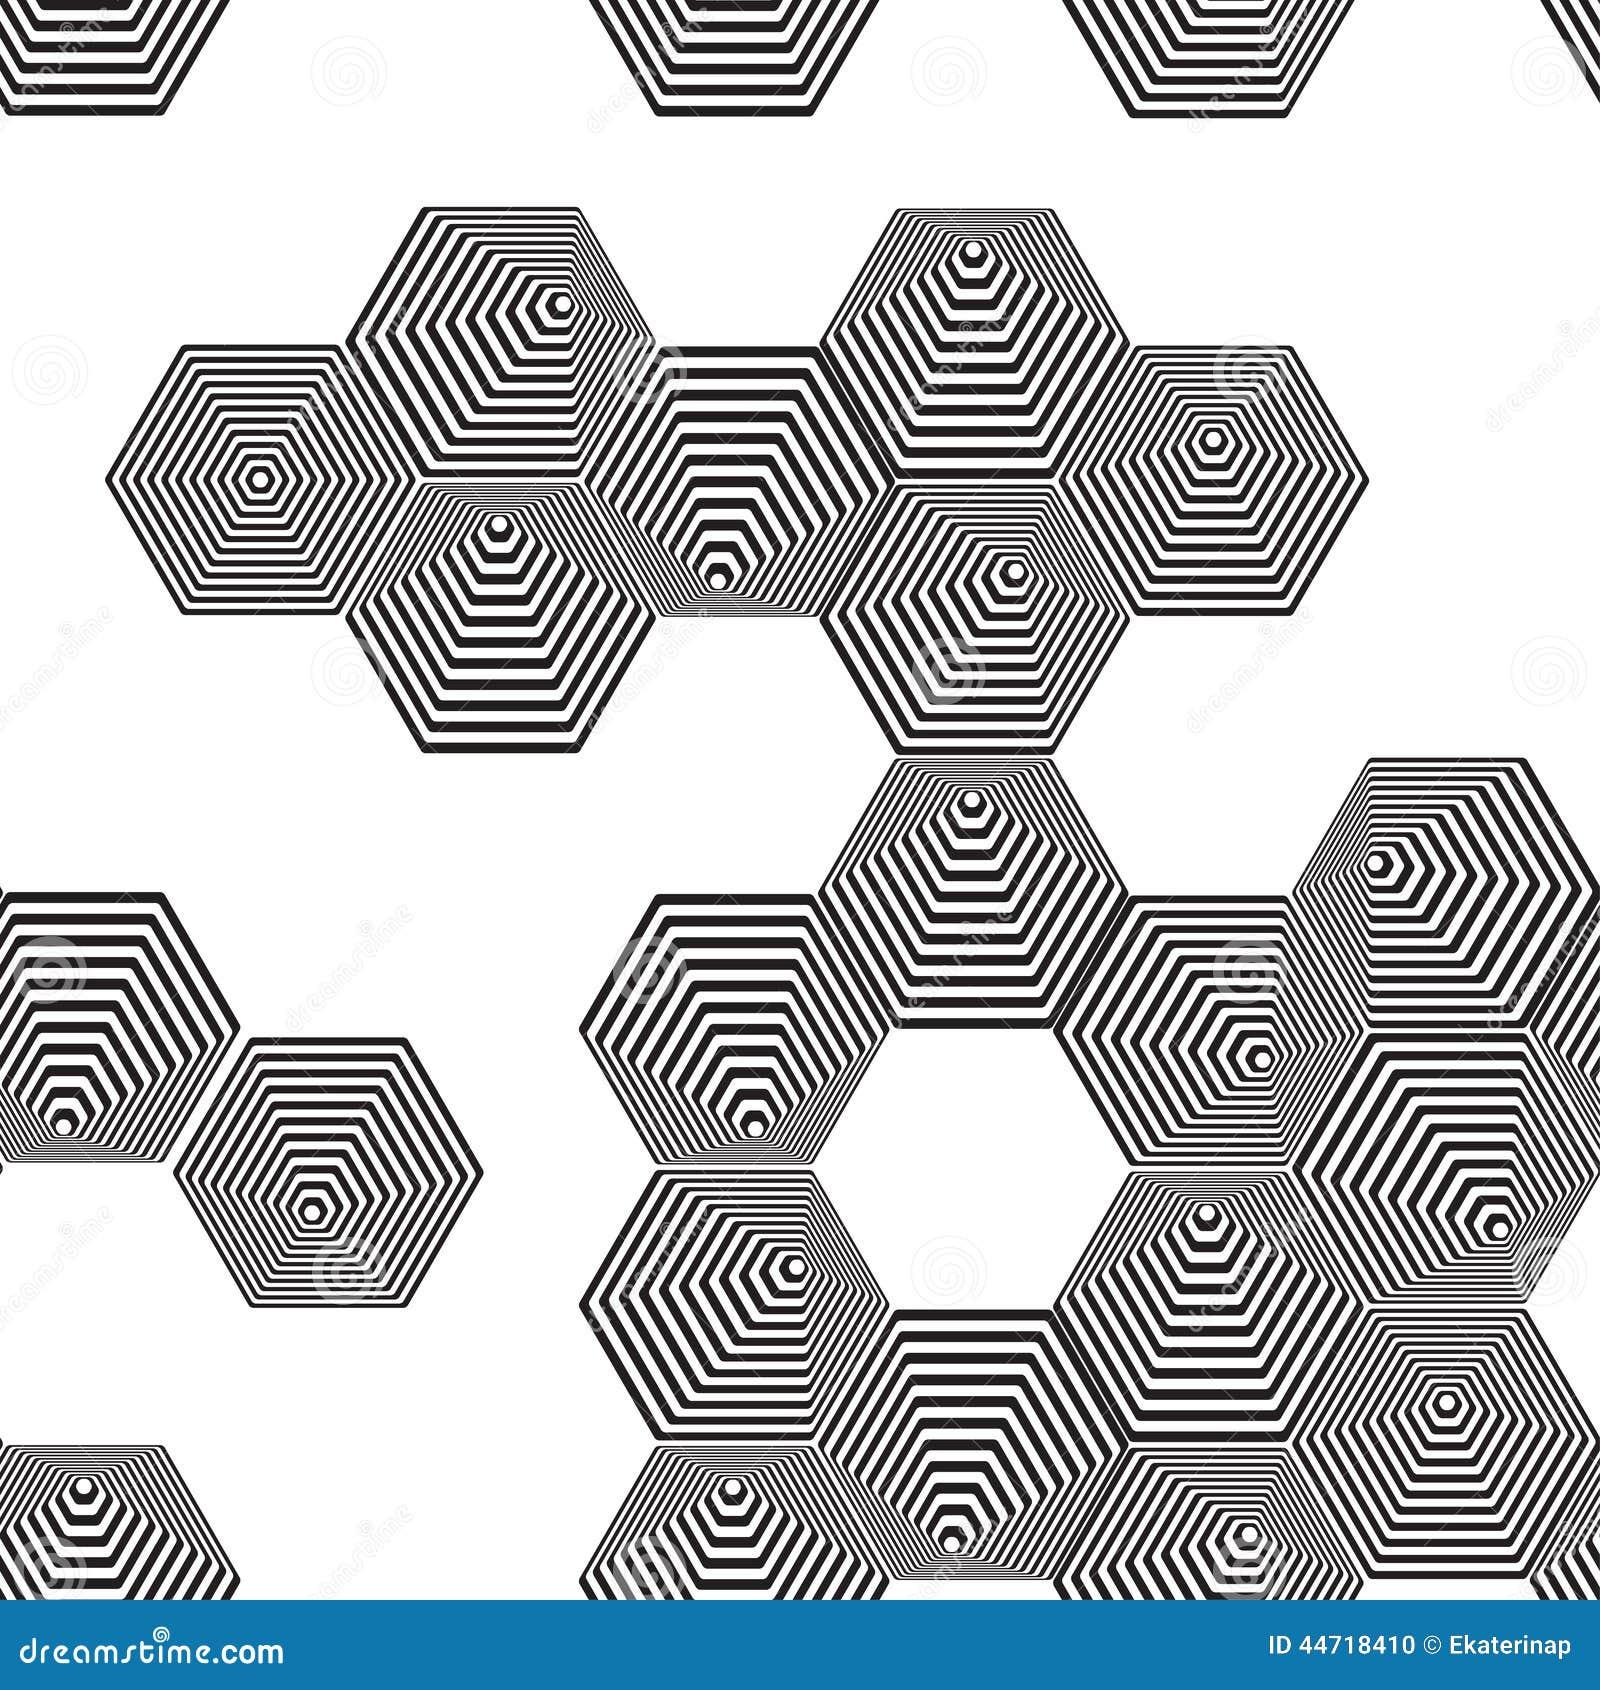 Volumetric 3D Pyramid Seamless Pattern. Hexagon. Optical Illusio ...